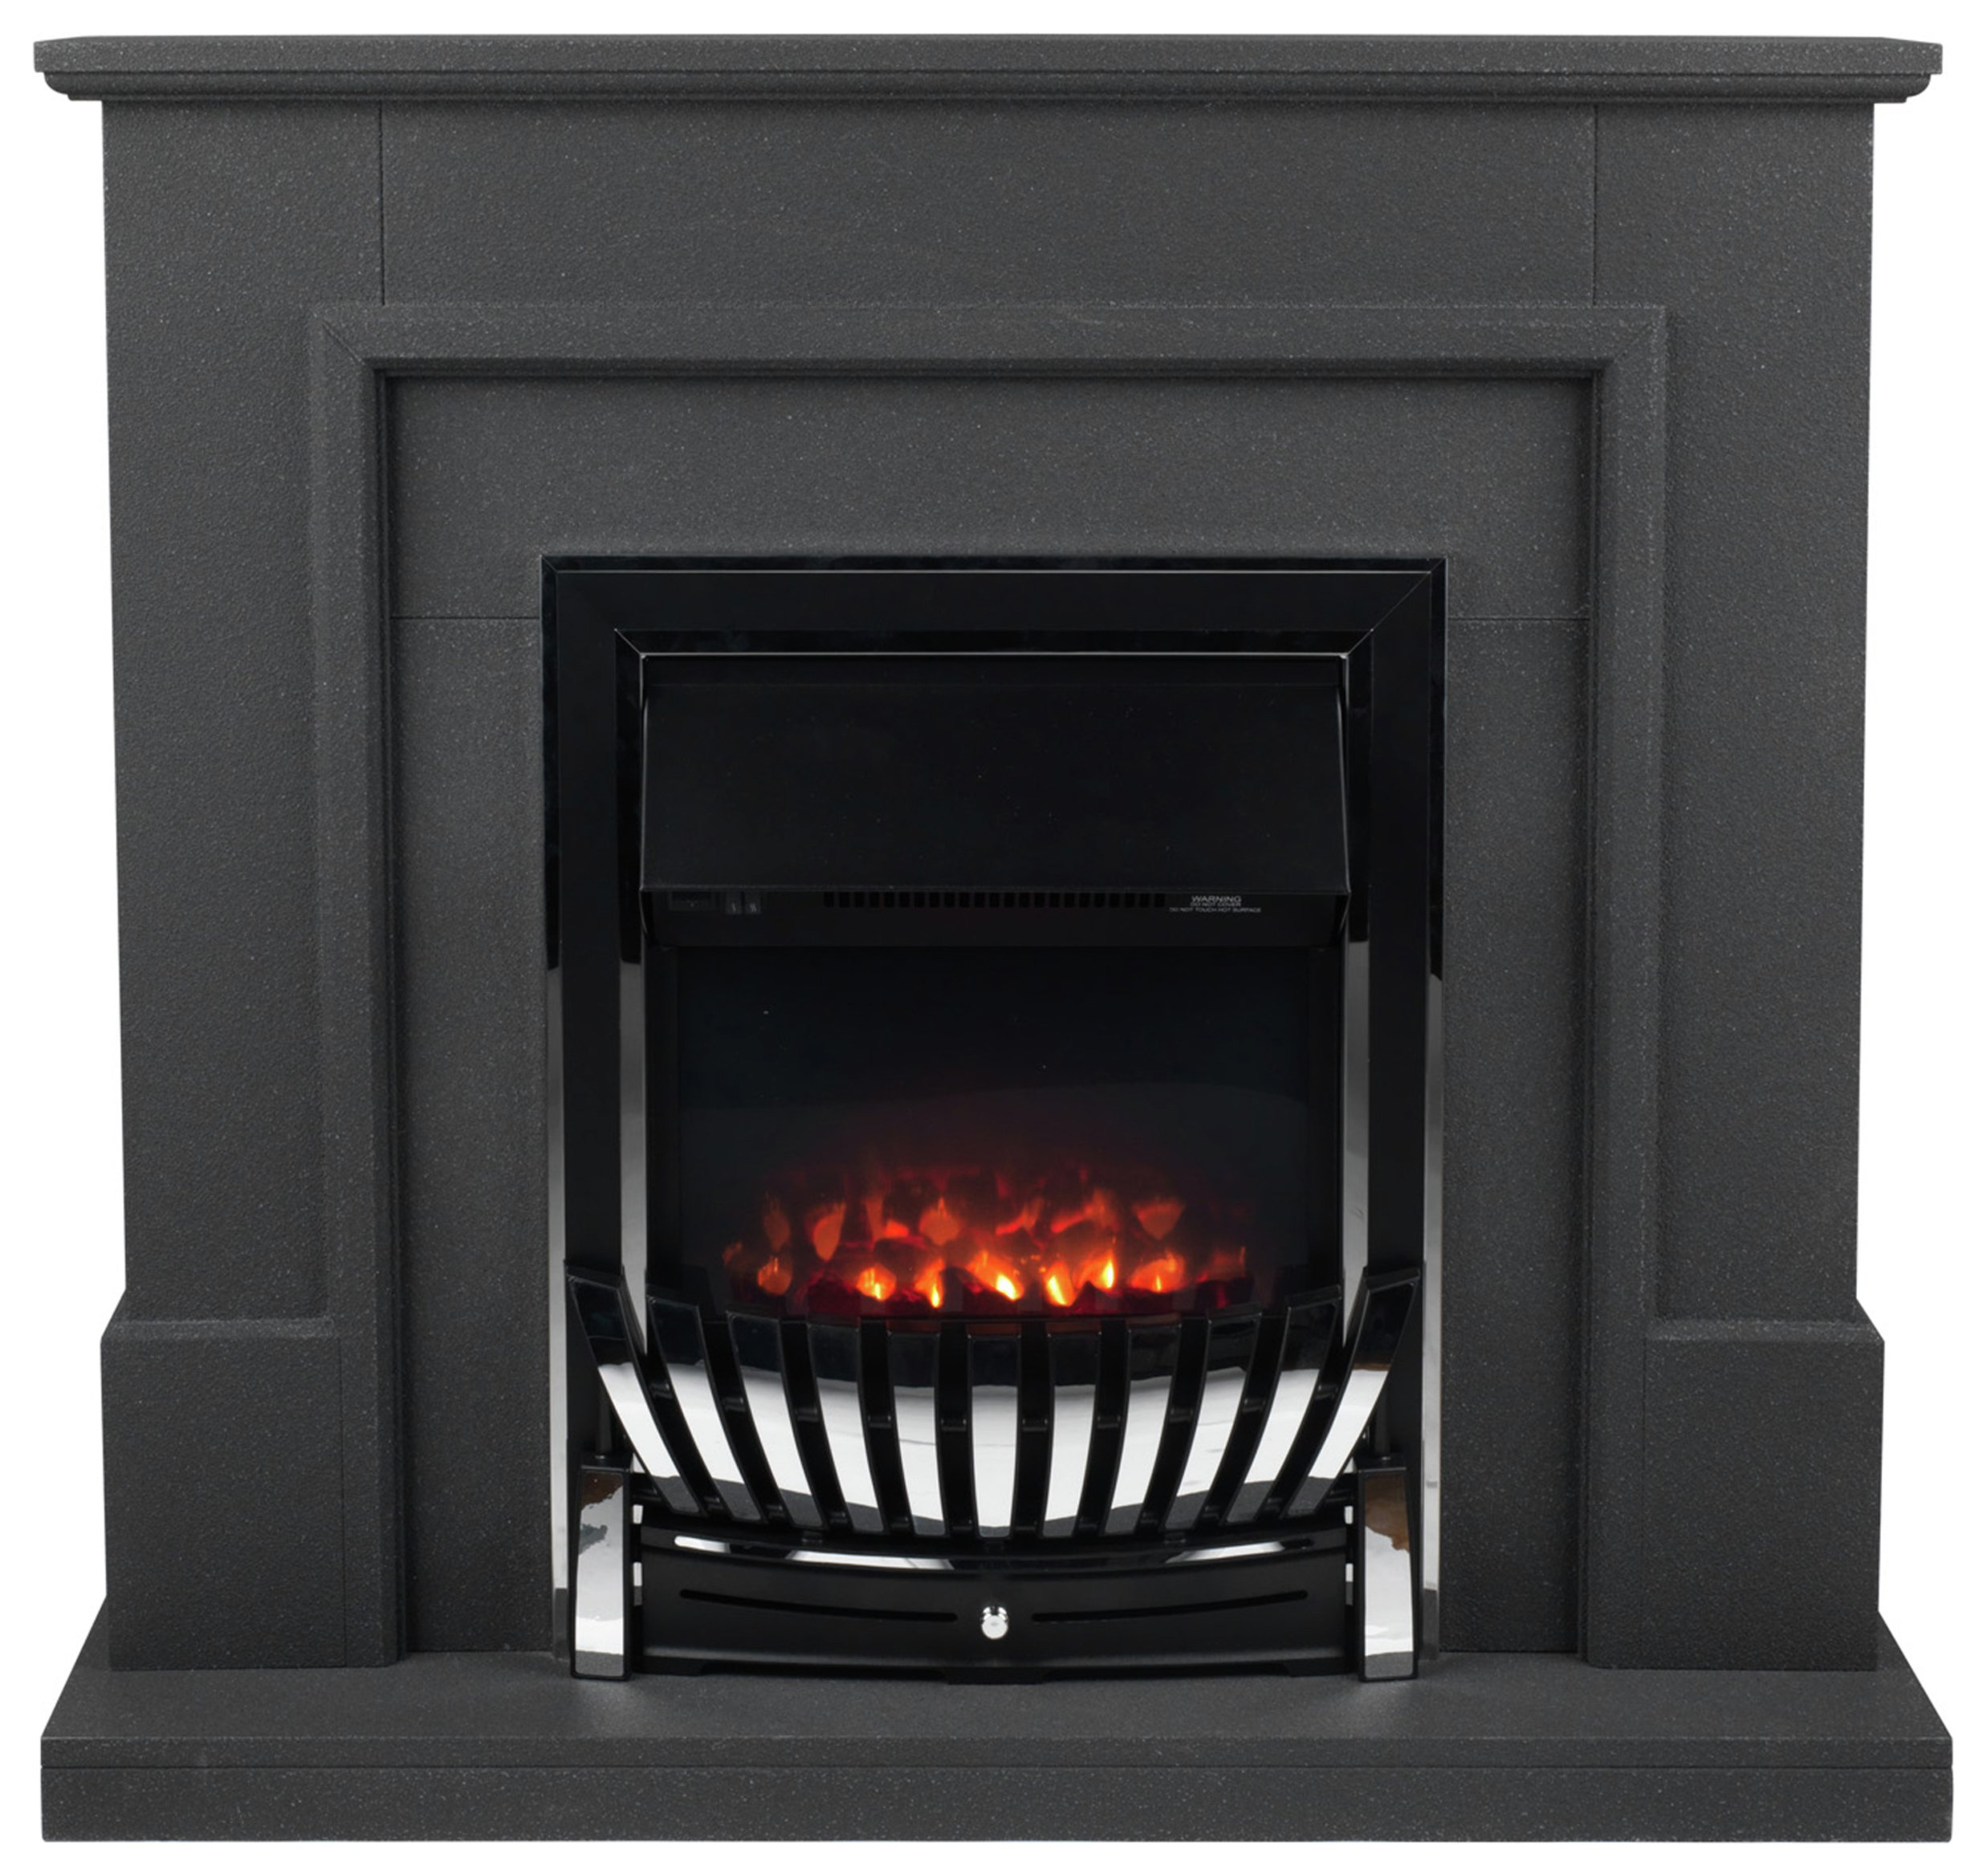 norfolk fire pipe or fire blower gift shop. Black Bedroom Furniture Sets. Home Design Ideas